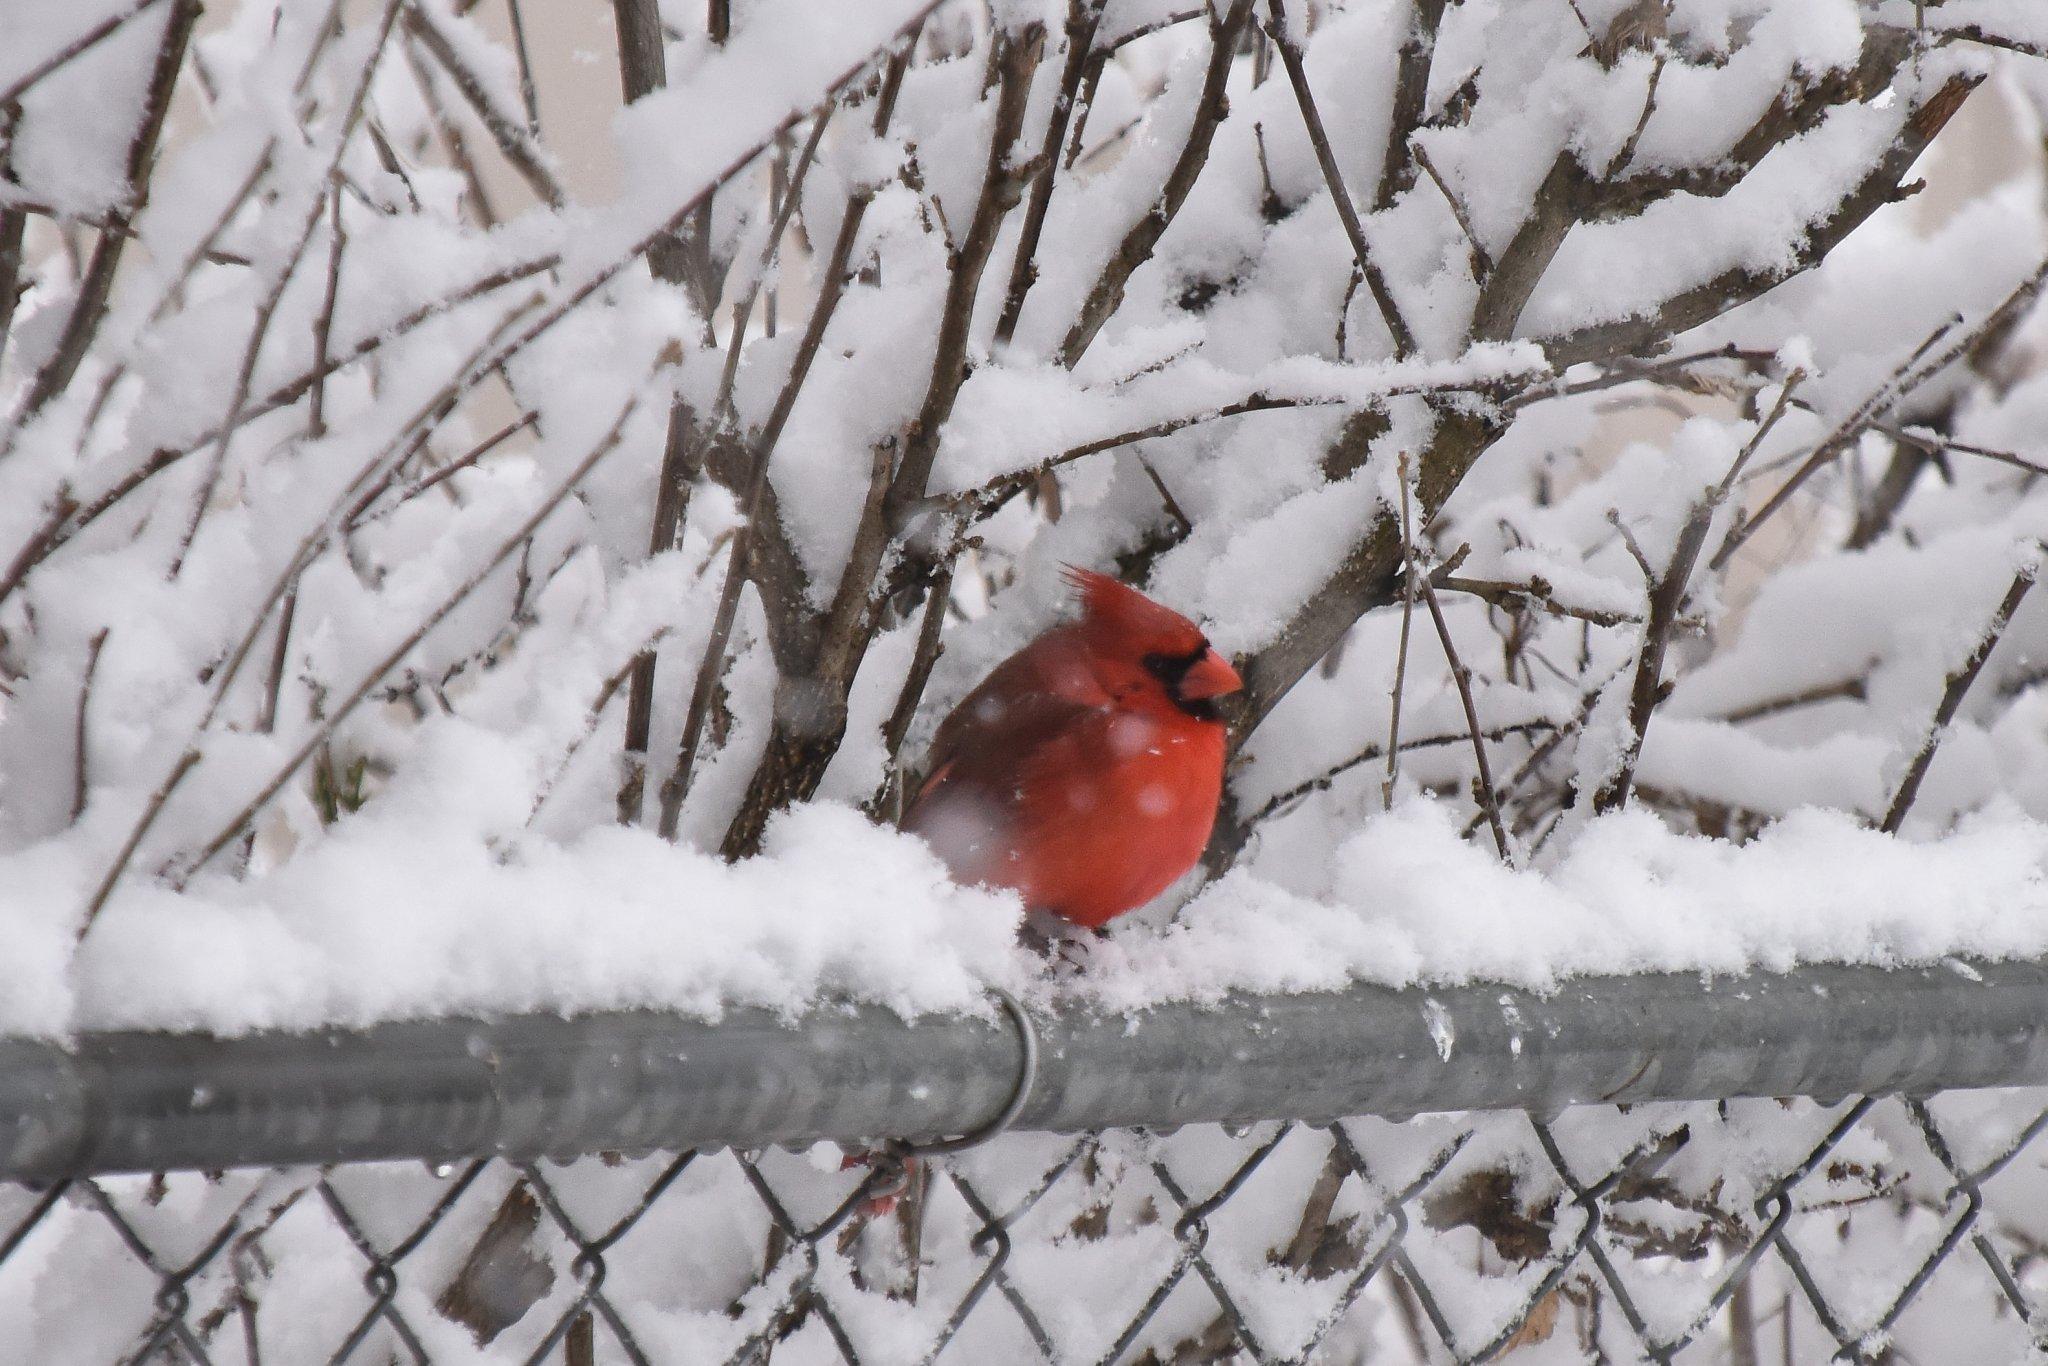 Cardinal in Snow_2_041620.JPG